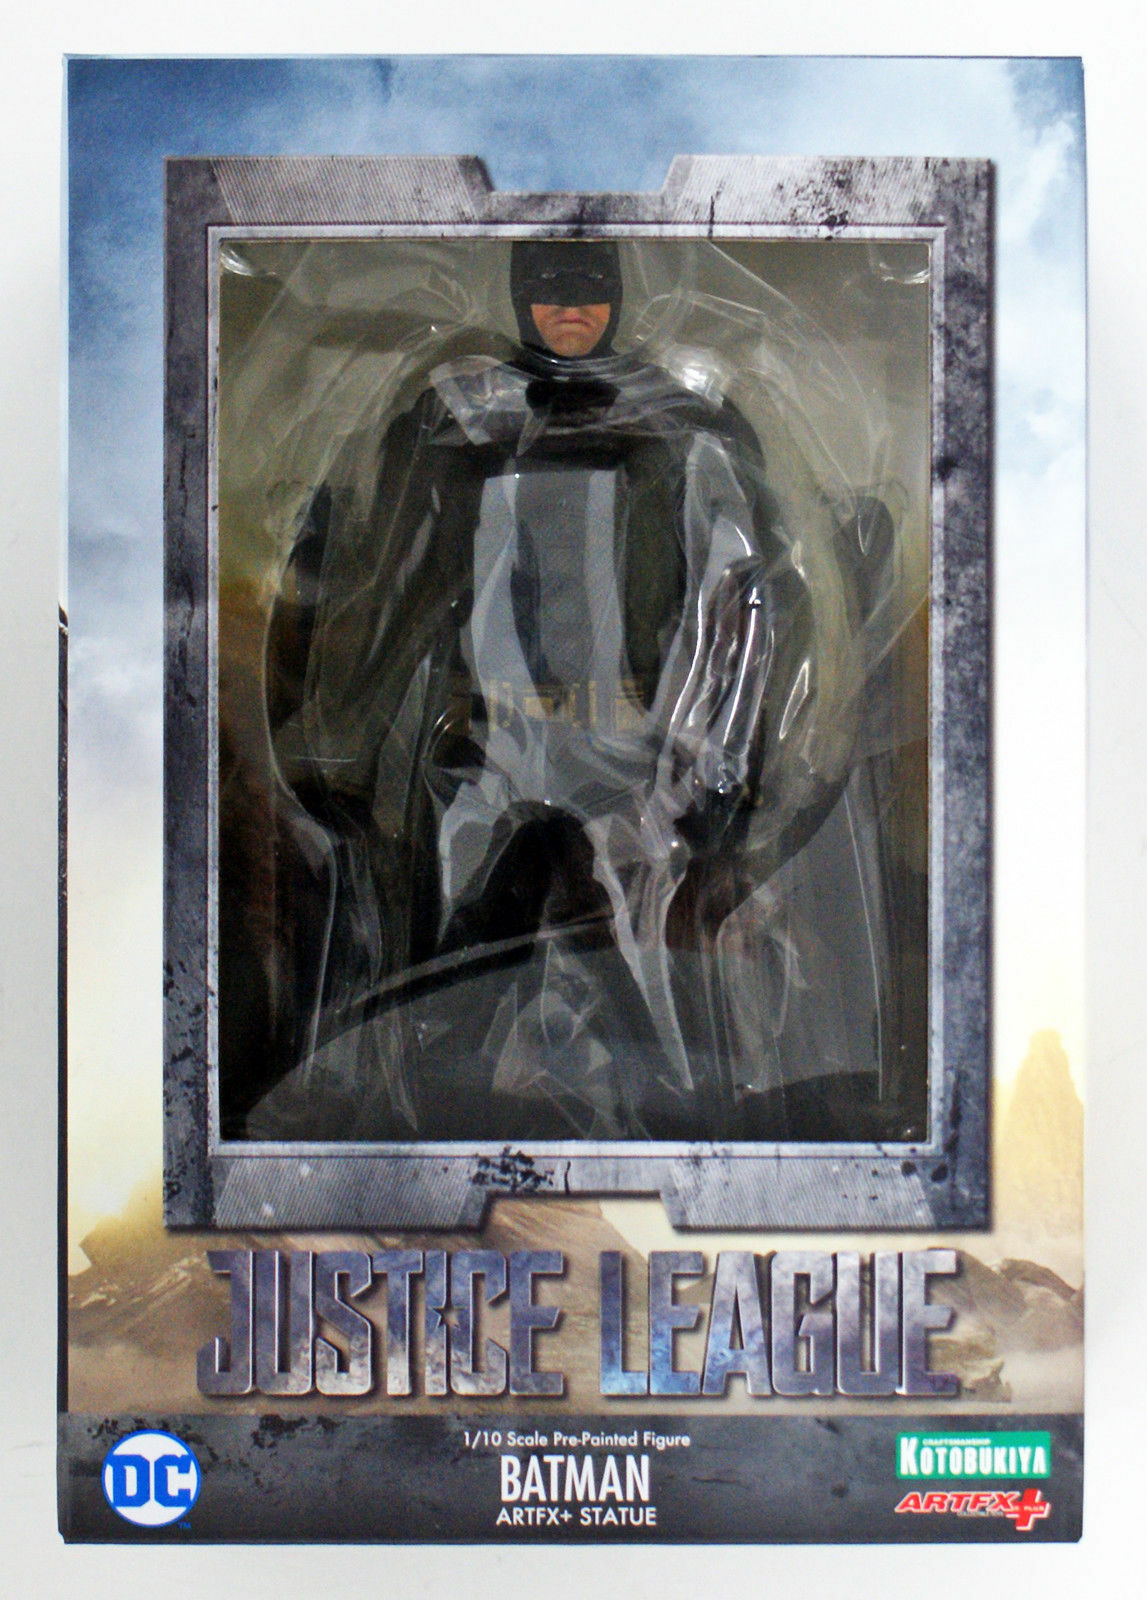 KOTOBUKIYA ARTFX+ JUSTICE LEAGUE BATMAN 1/10 SCALE STATUE BVS BRAND NEW N HAND